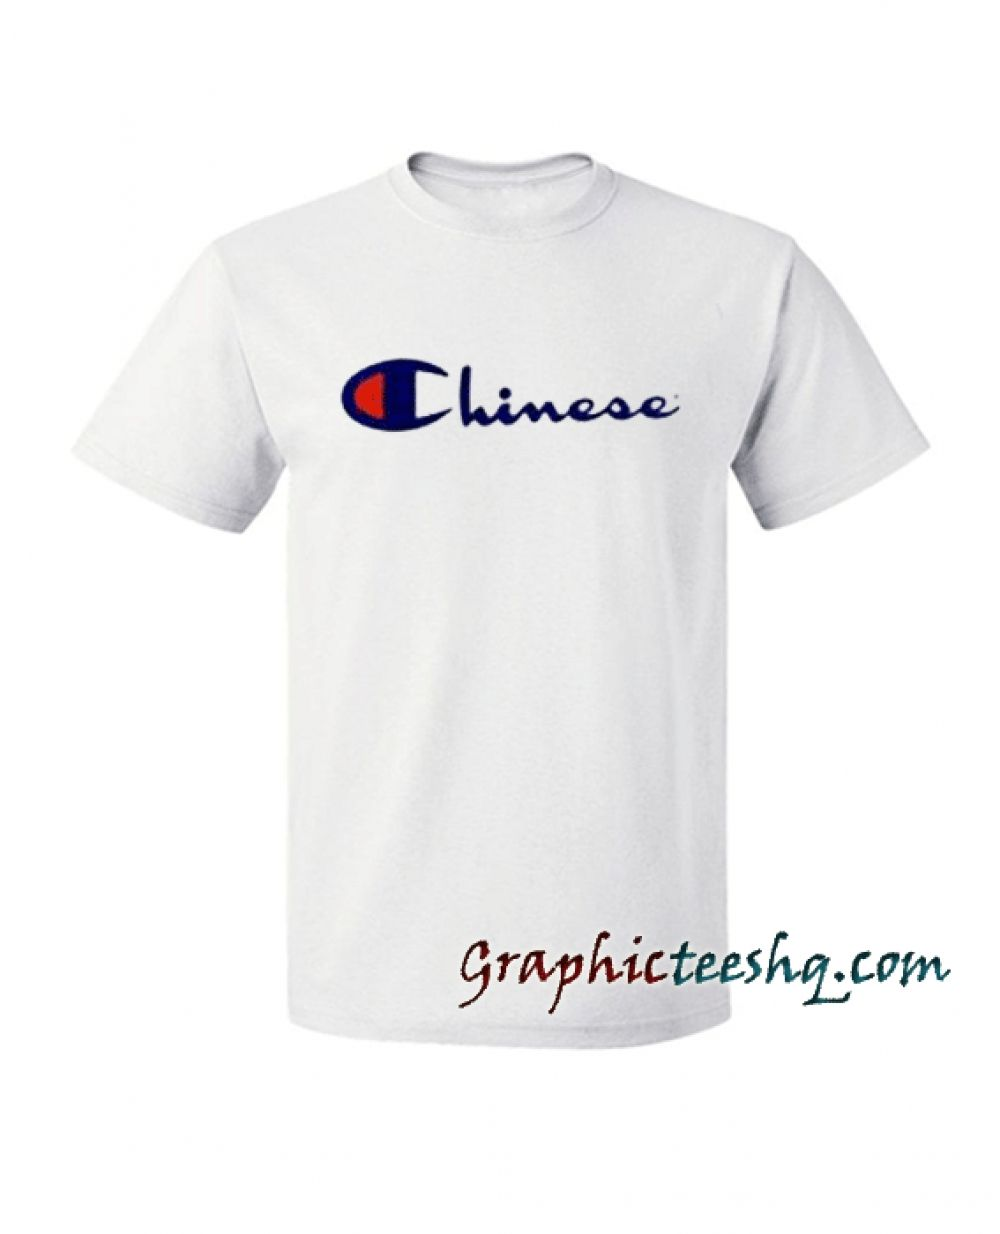 202fce070290 Chinese Champion Tee Shirt Price  13.50  style  fashion  tshirts  tee   tshirtdesign instafashion  black  cute  art  amazing funny  webstagram   lol  hot ...